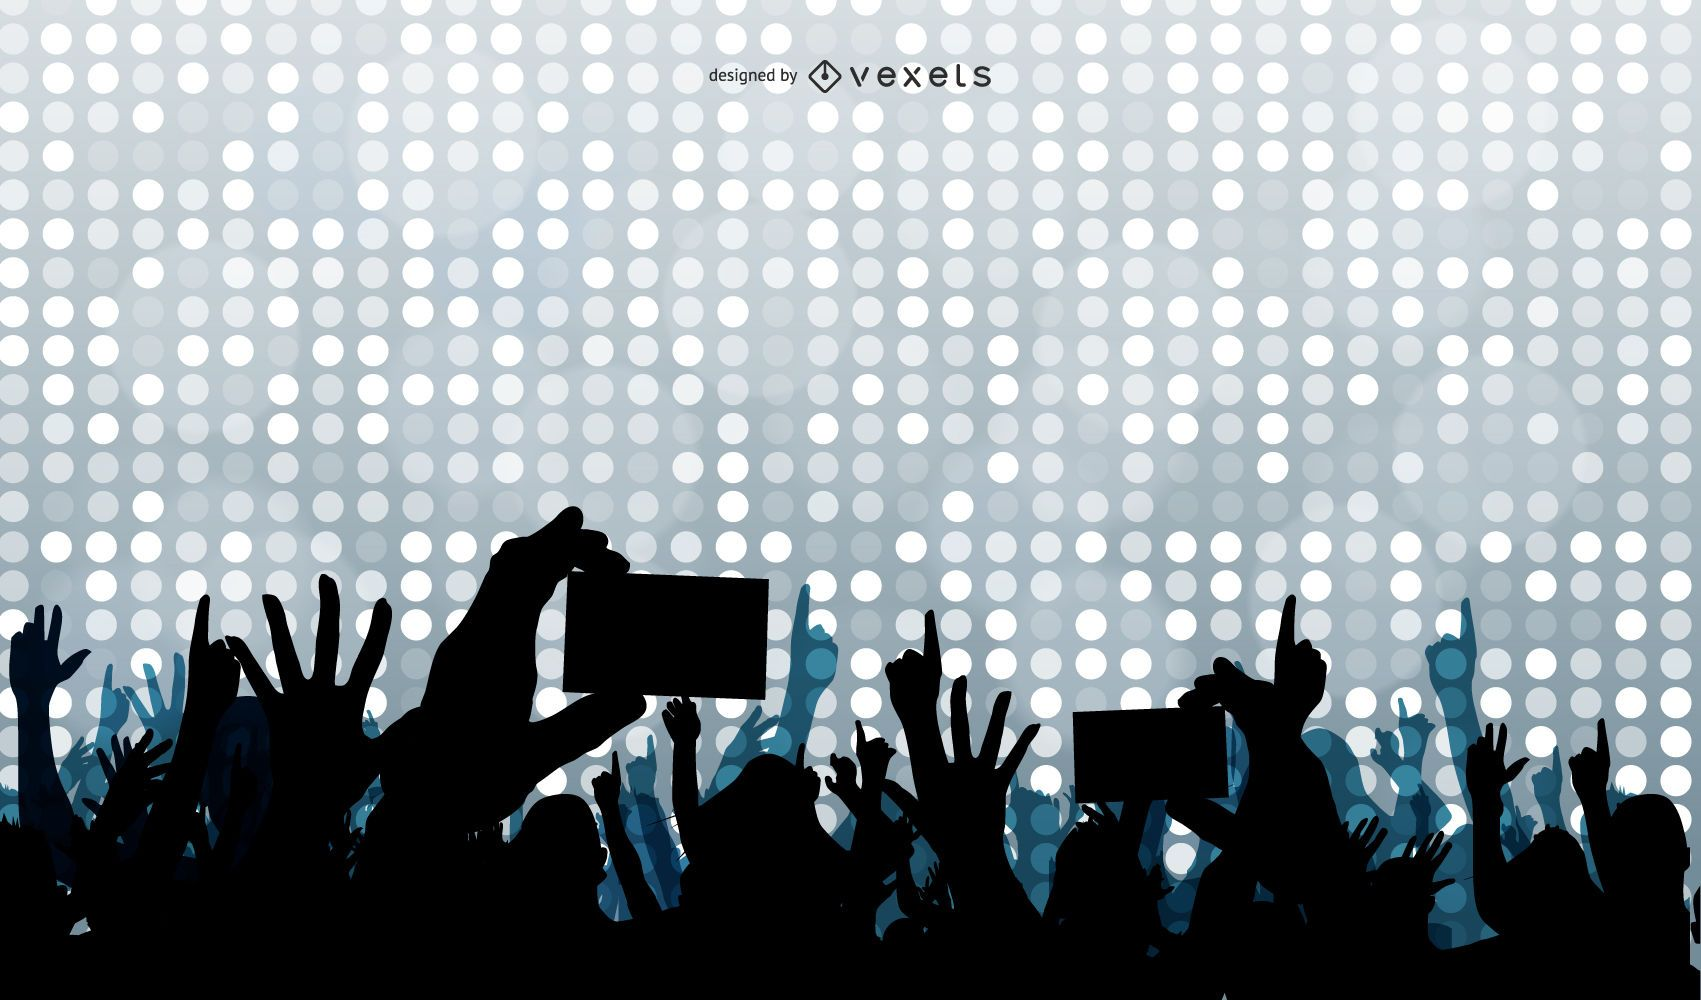 Concert Crowds Raising Hands Silhouette